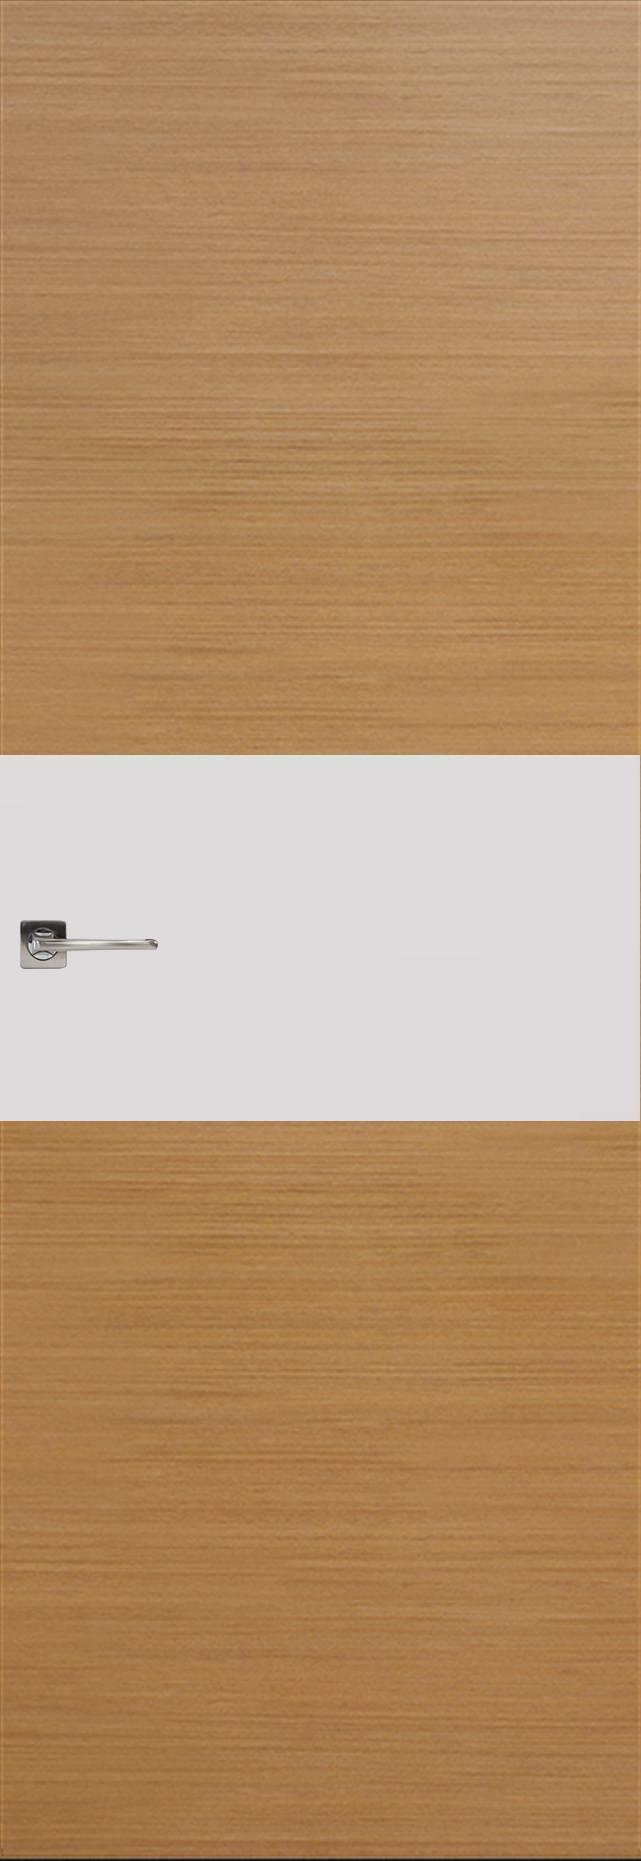 Tivoli Е-4 Invisible цвет - Миланский орех Без стекла (ДГ)